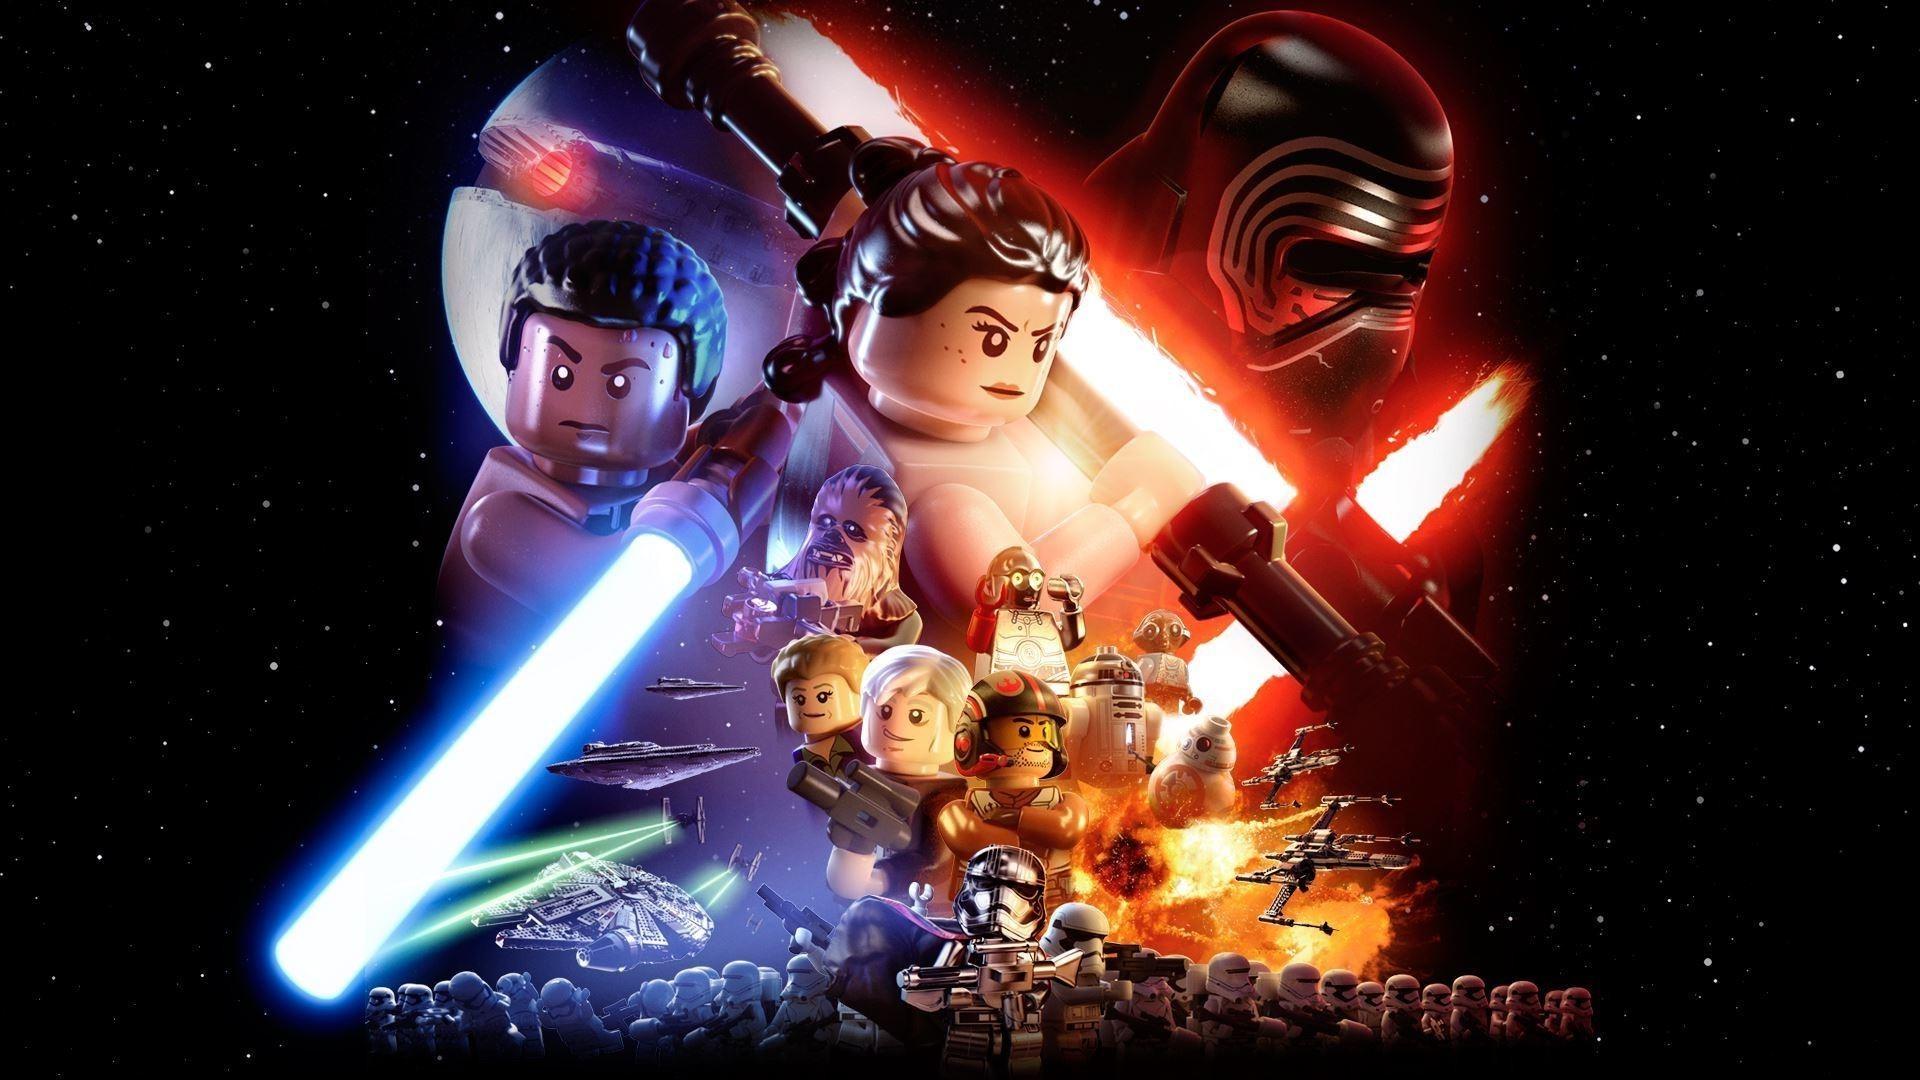 Lego Star Wars Lego Star Wars The Force Awakens 1920x1080 Wallpaper Teahub Io